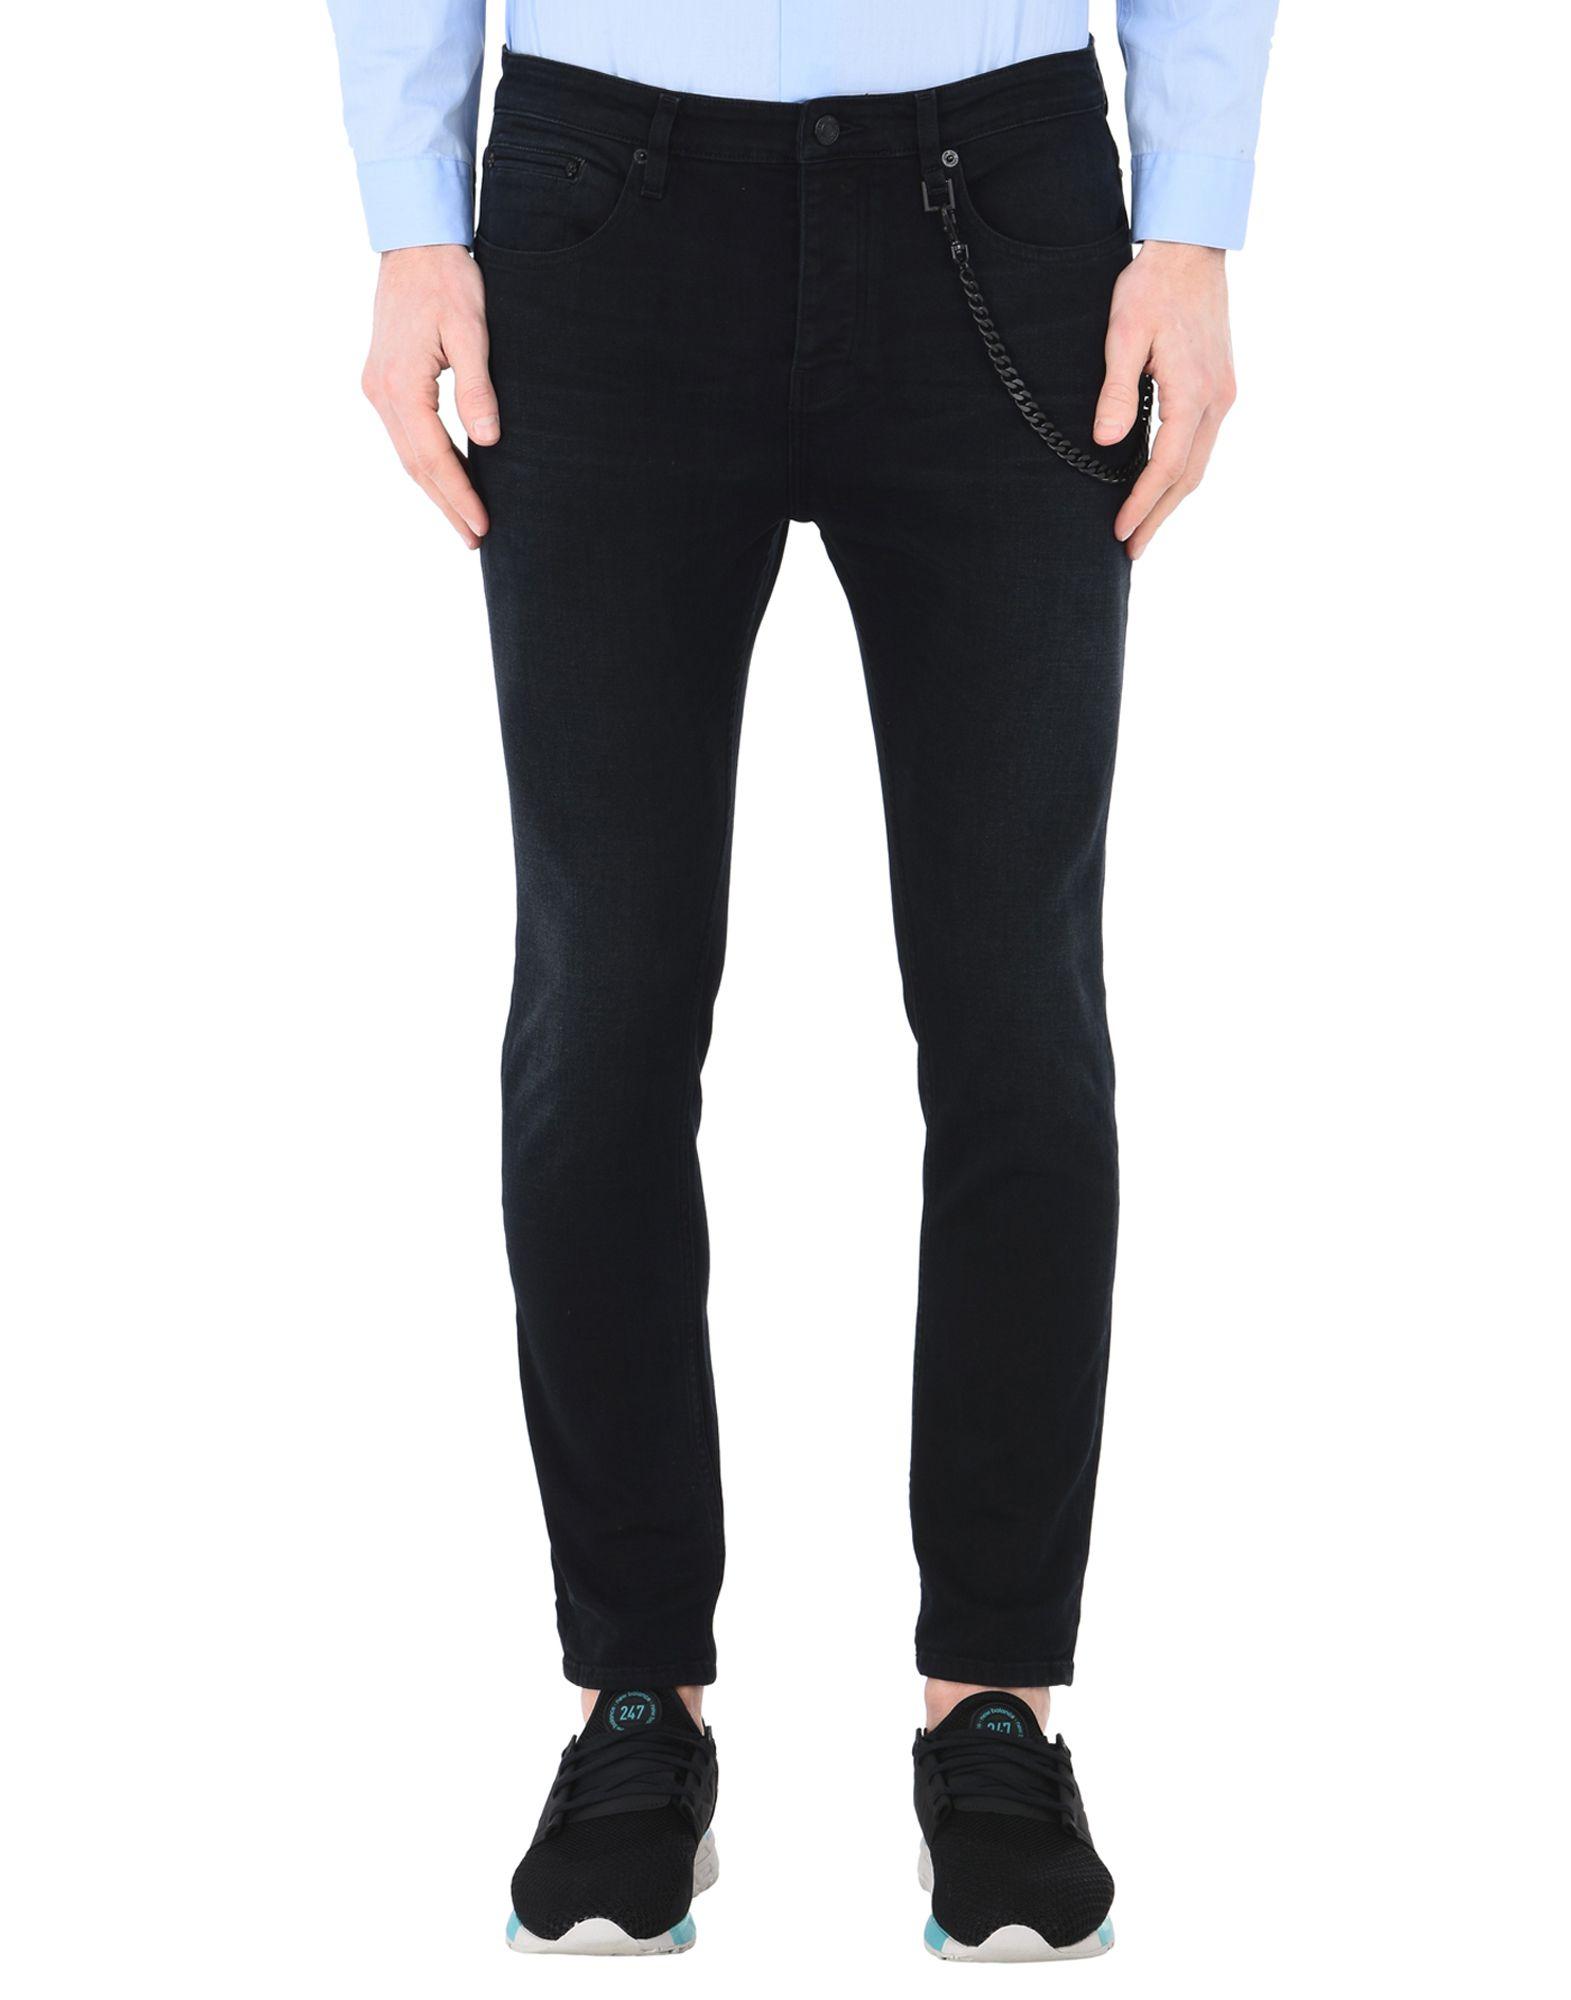 5 Tasche The Kooples Skinny Denim Trousers - Uomo - Acquista online su